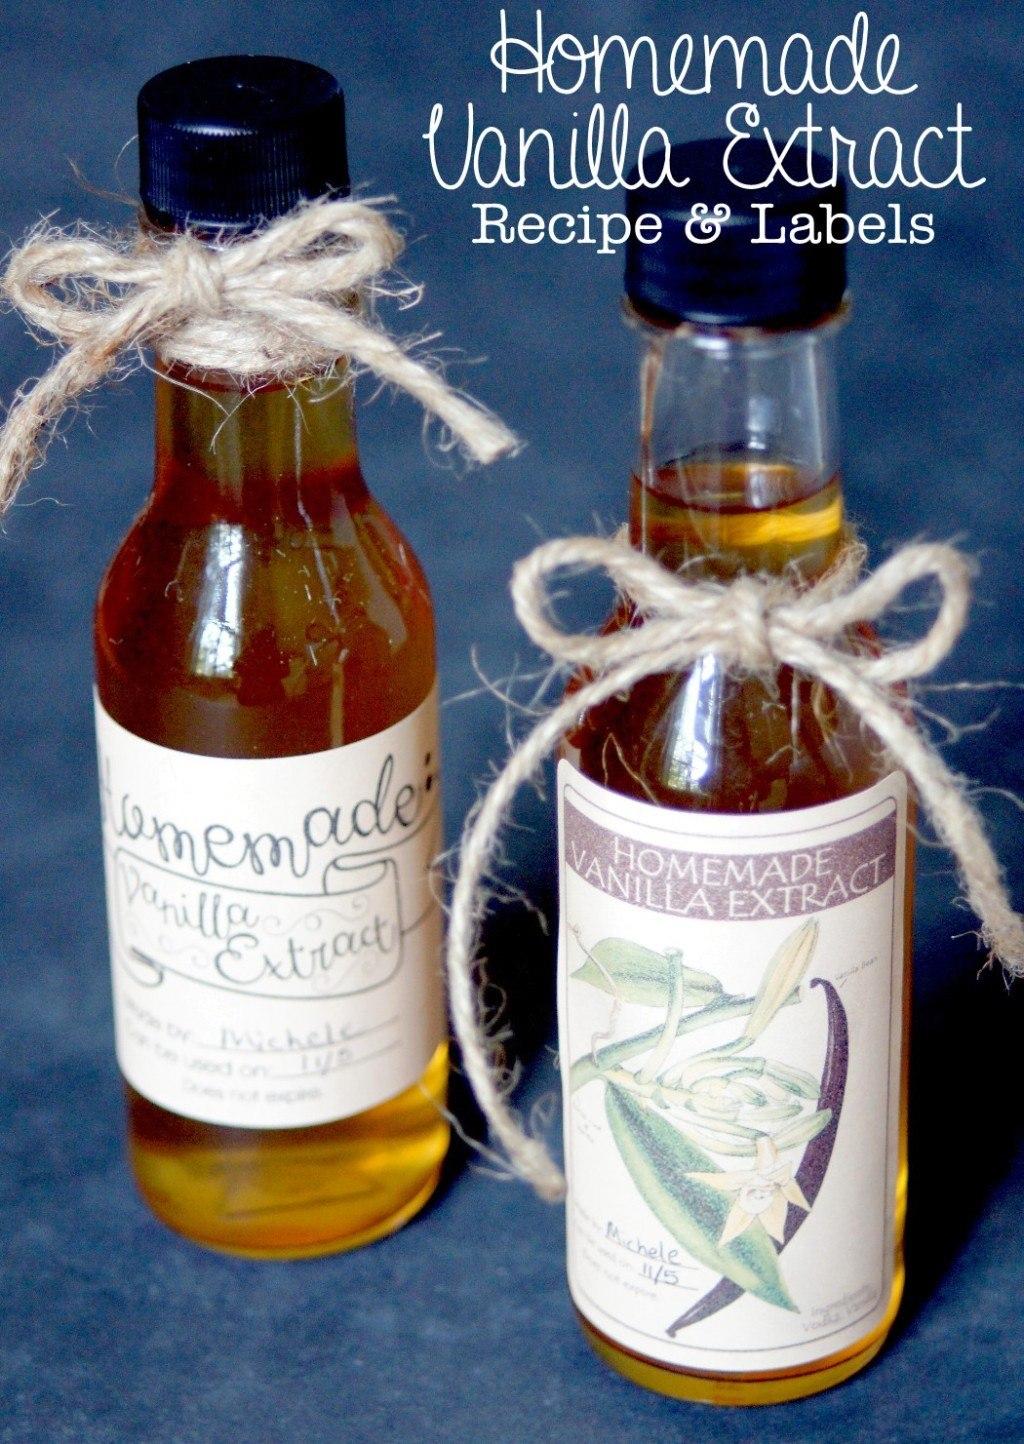 Homemade Vanilla Extract Recipe  Labels Regarding Homemade Vanilla Extract Label Template